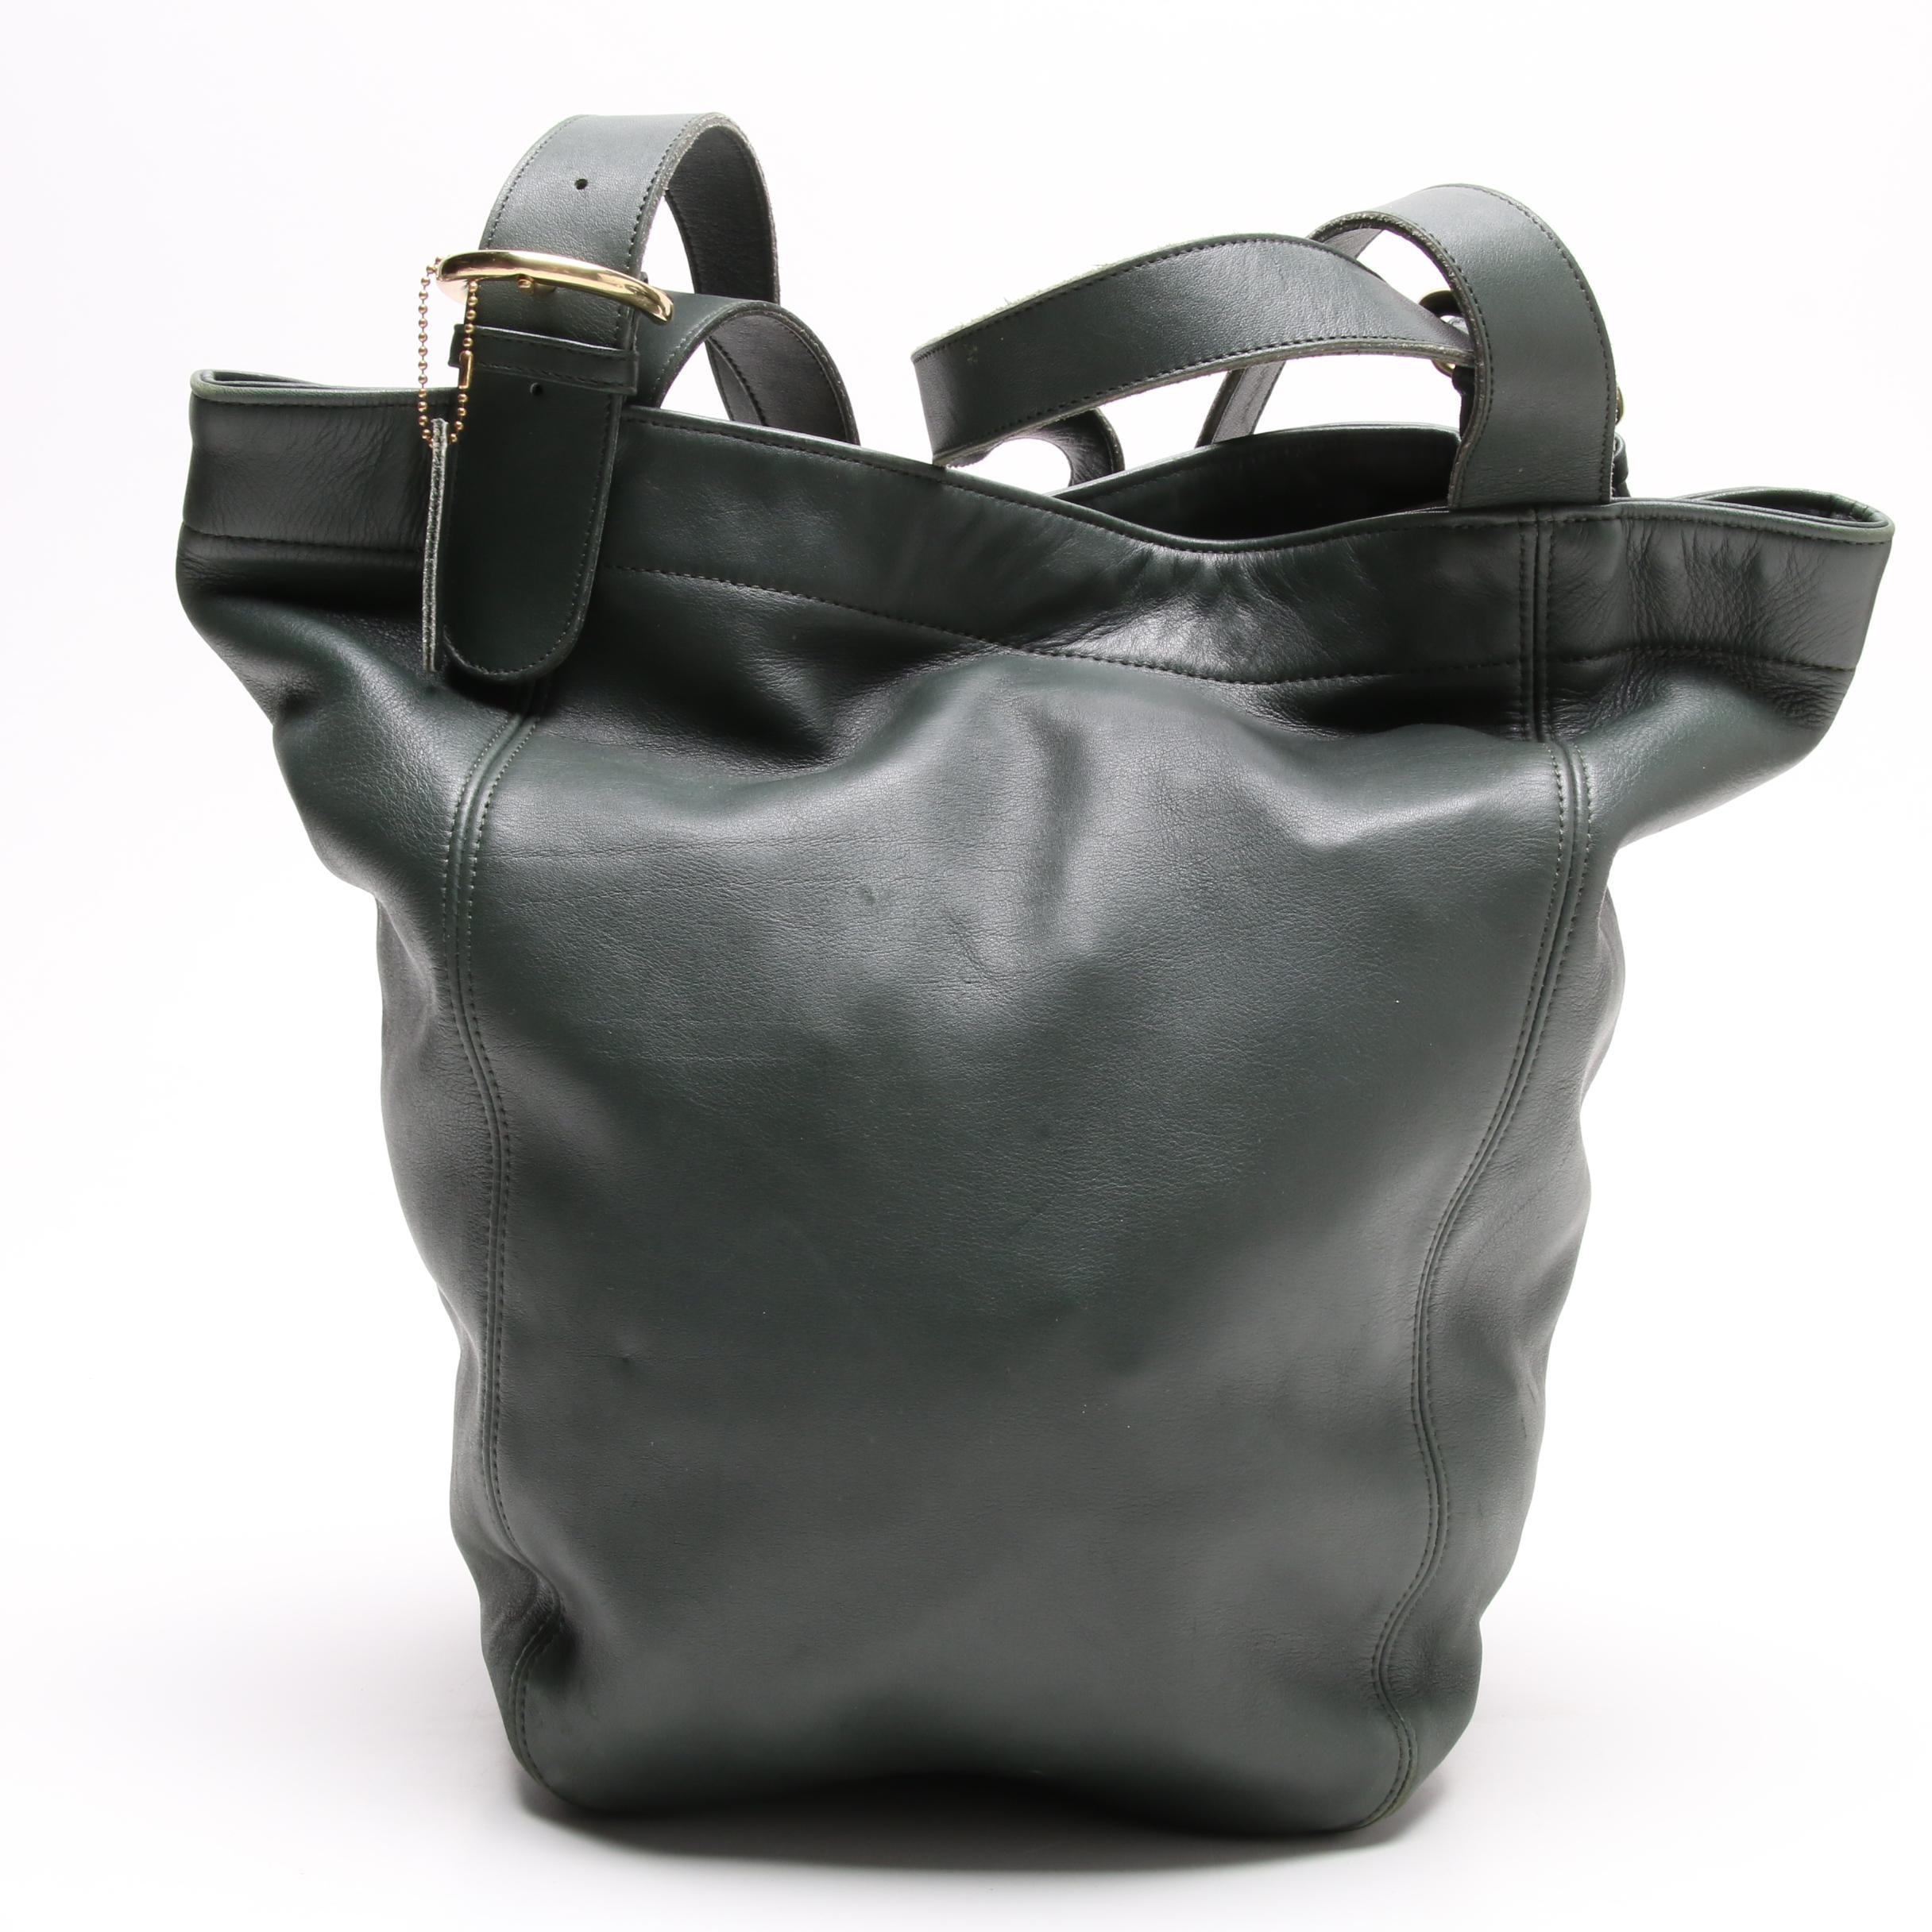 Vintage Coach Green Leather Soho Waverly Duffel Bucket Bag